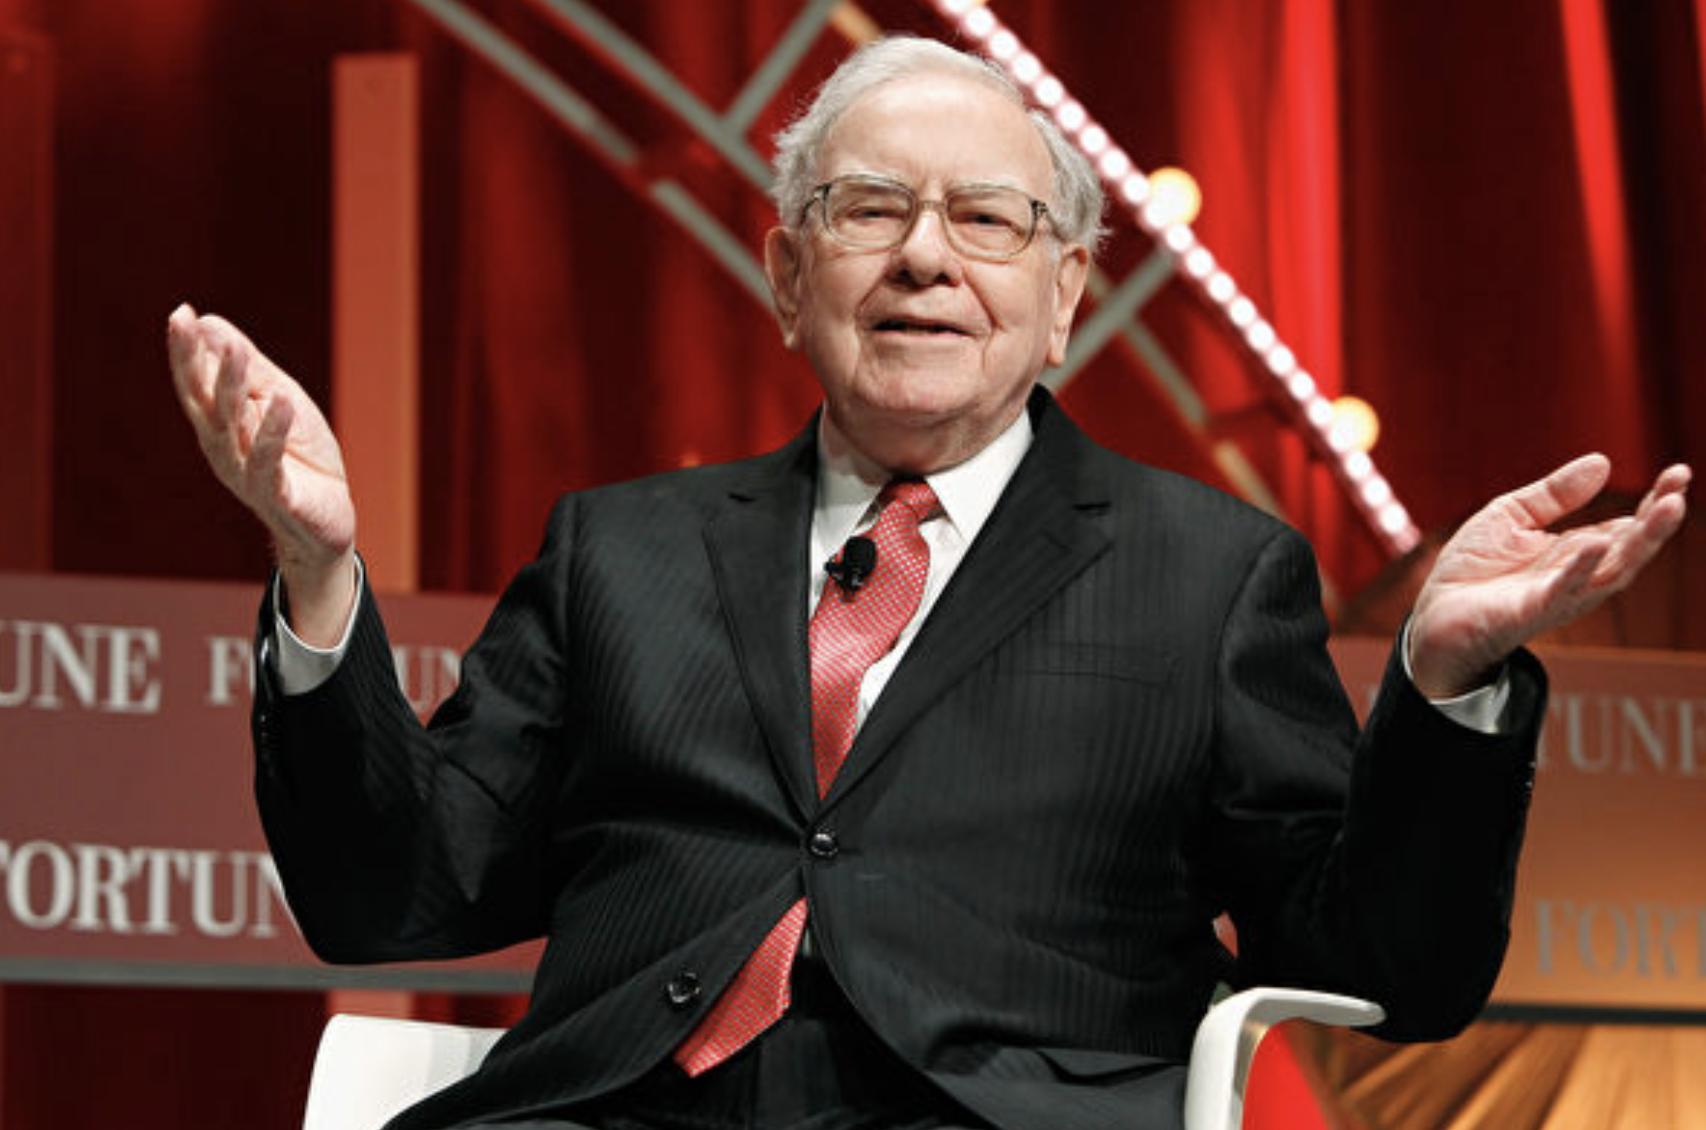 美國著名投資家、企業家畢菲特資料照。(Paul Morigi/Getty Images)